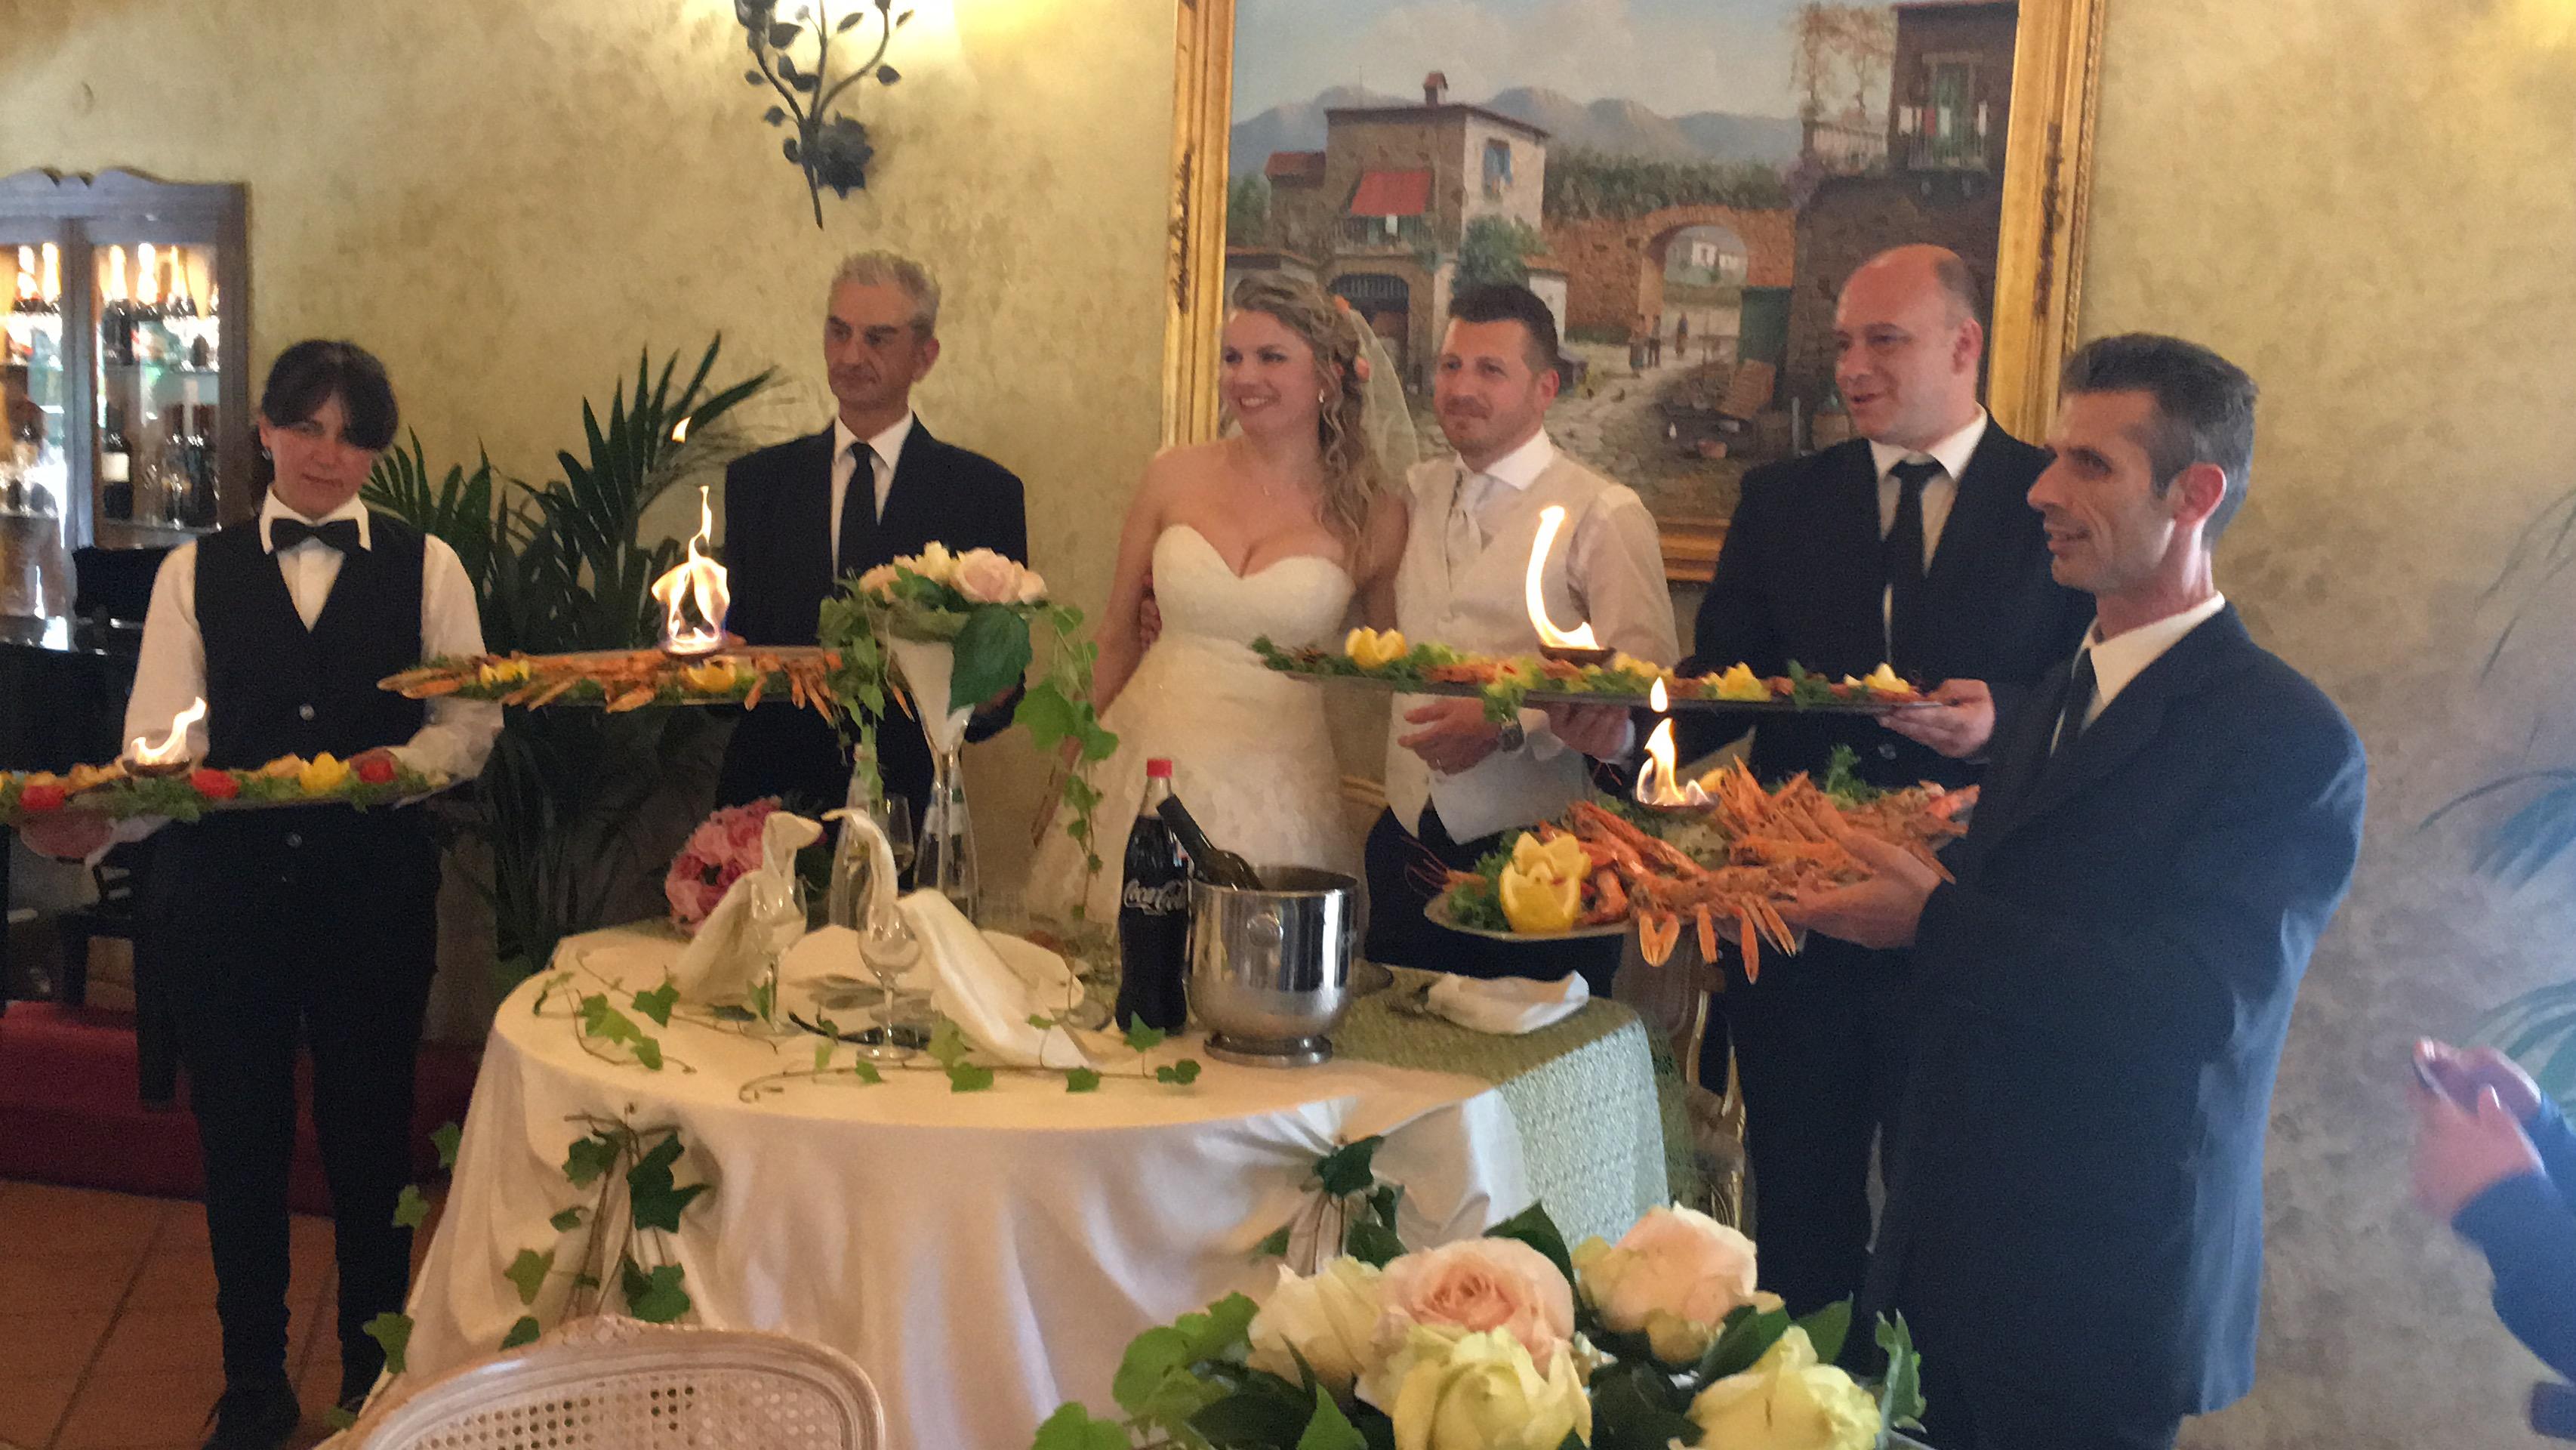 Фото 9 свадьба в Риме | Лидия и Оттавио | ведущая в Италии - Катрин Моро